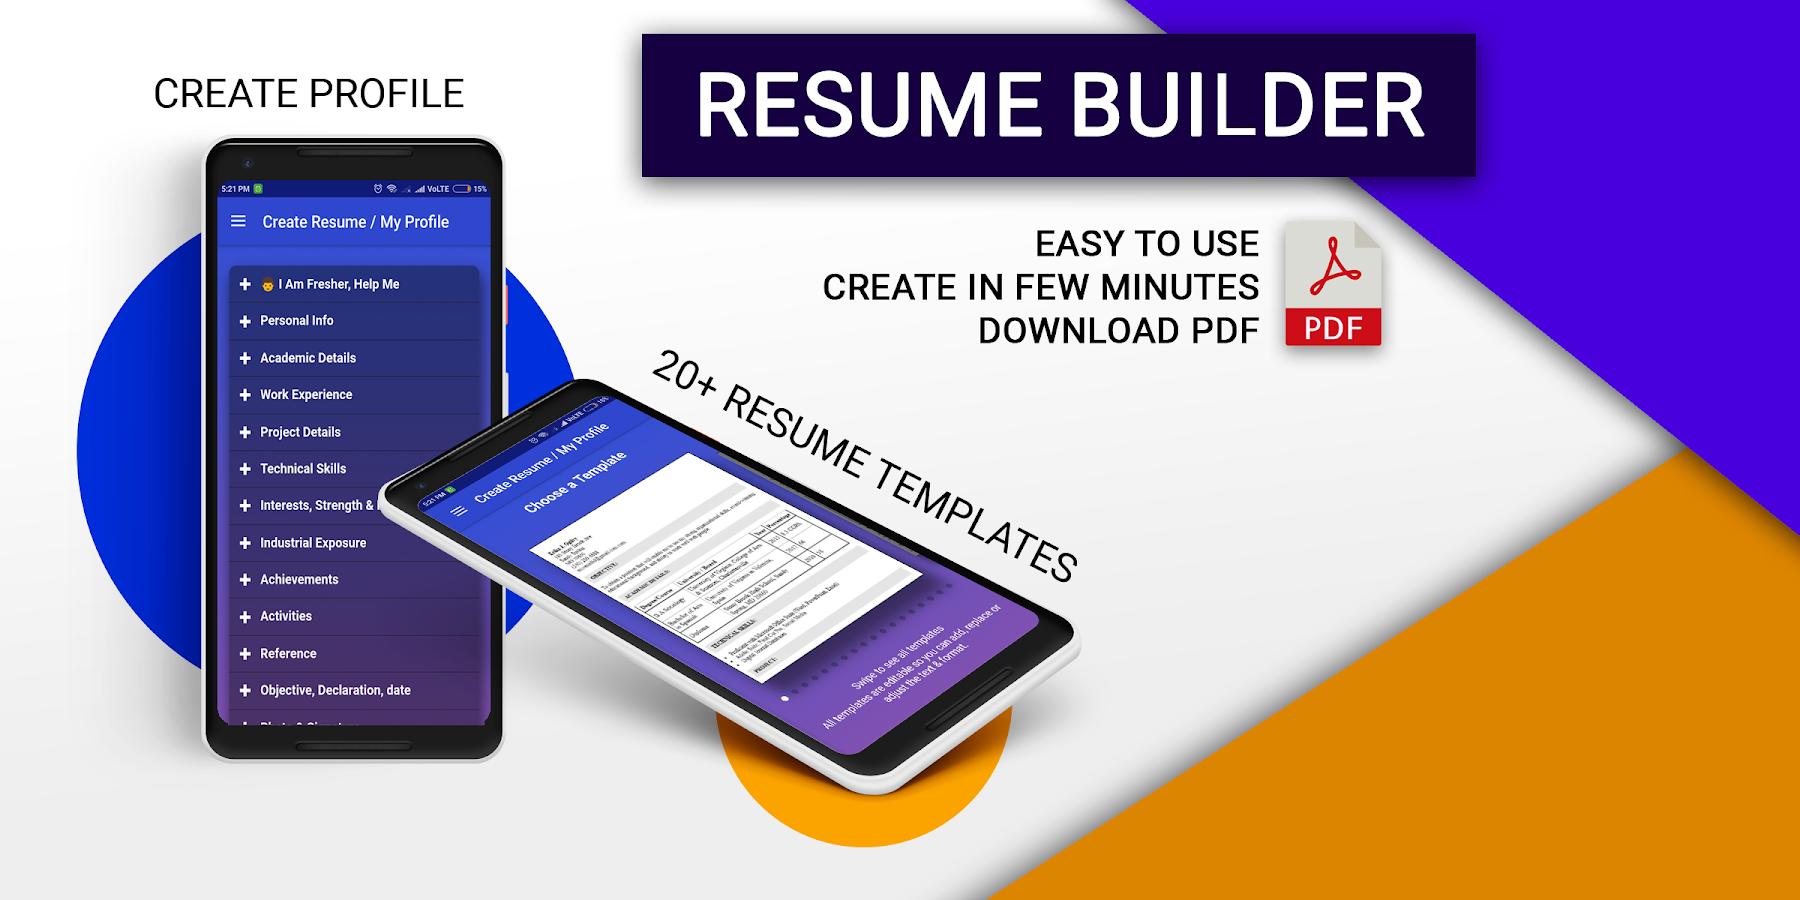 resume builder pro 3 min free cv maker templates screenshot - Resume Builder For Freshers